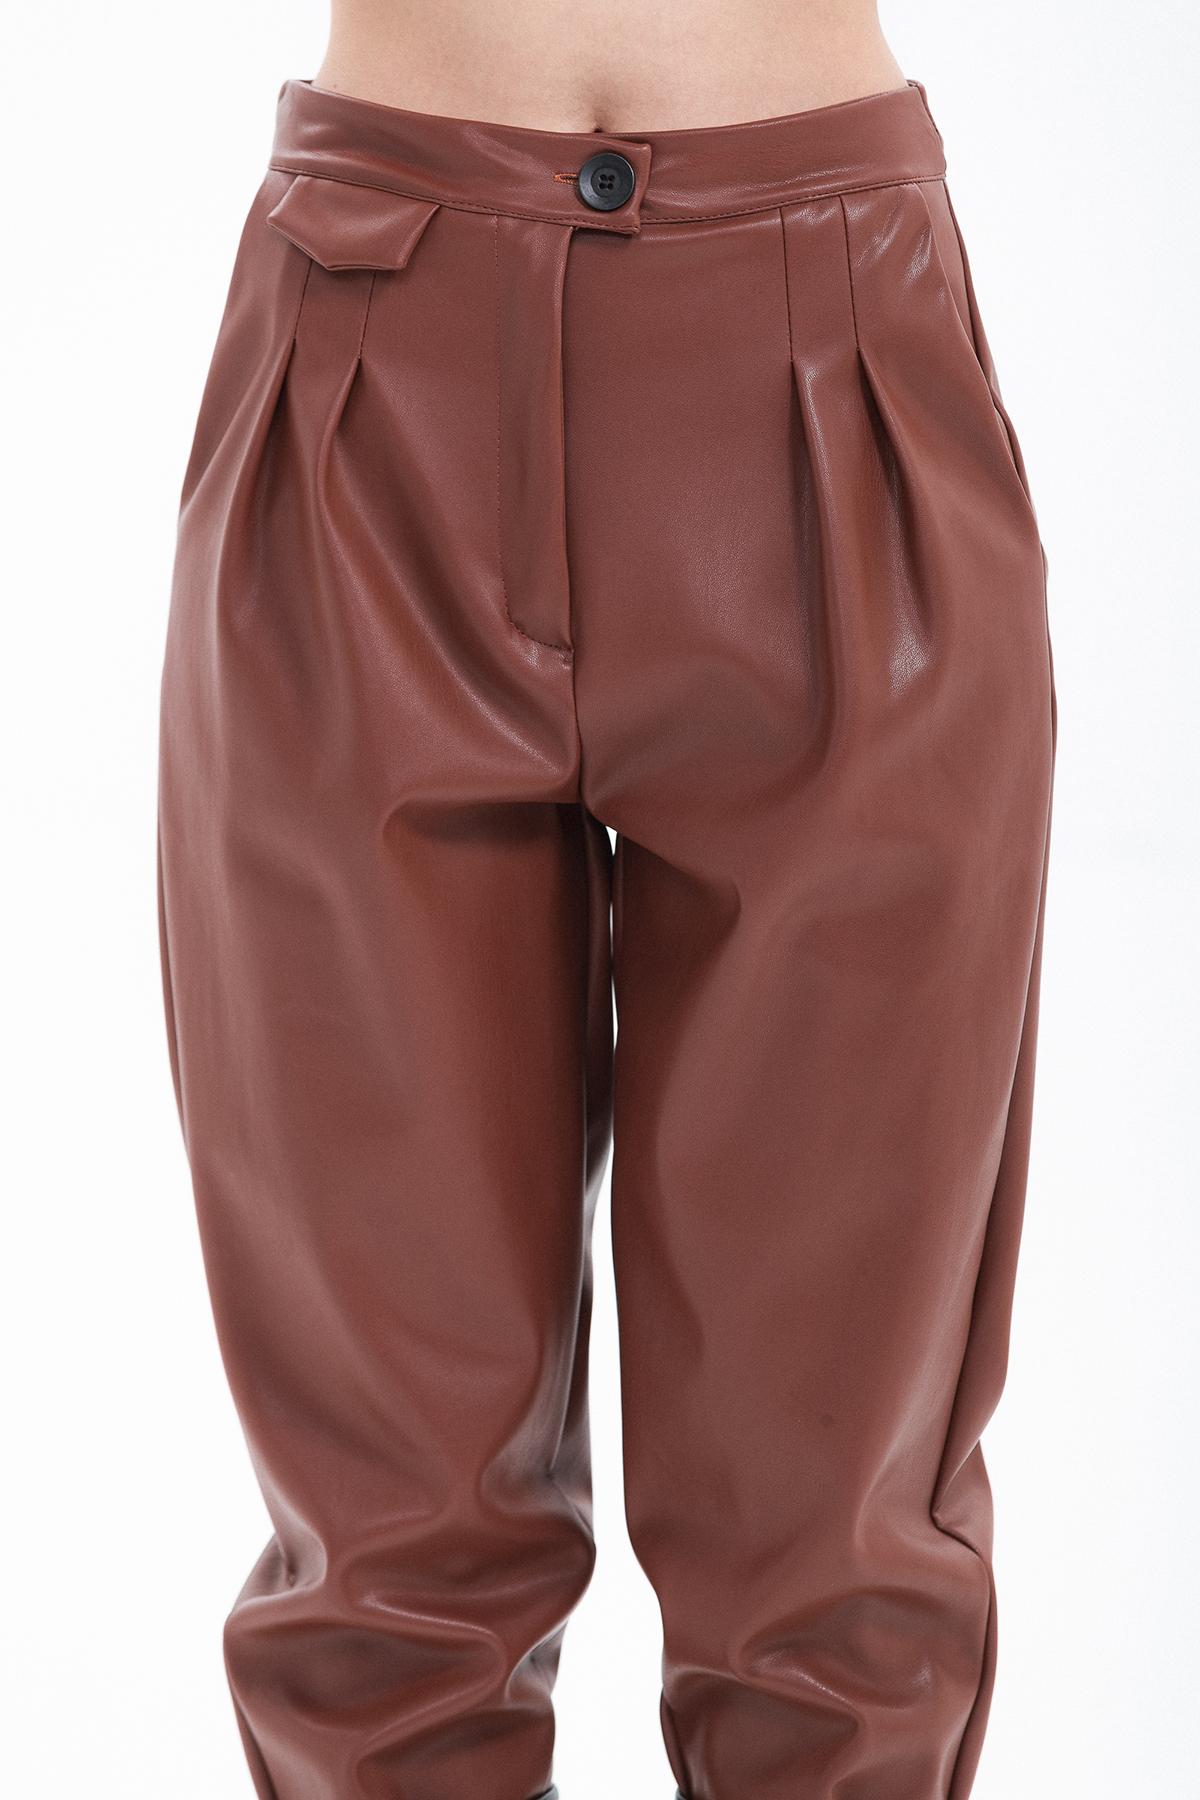 pantalone con pinces